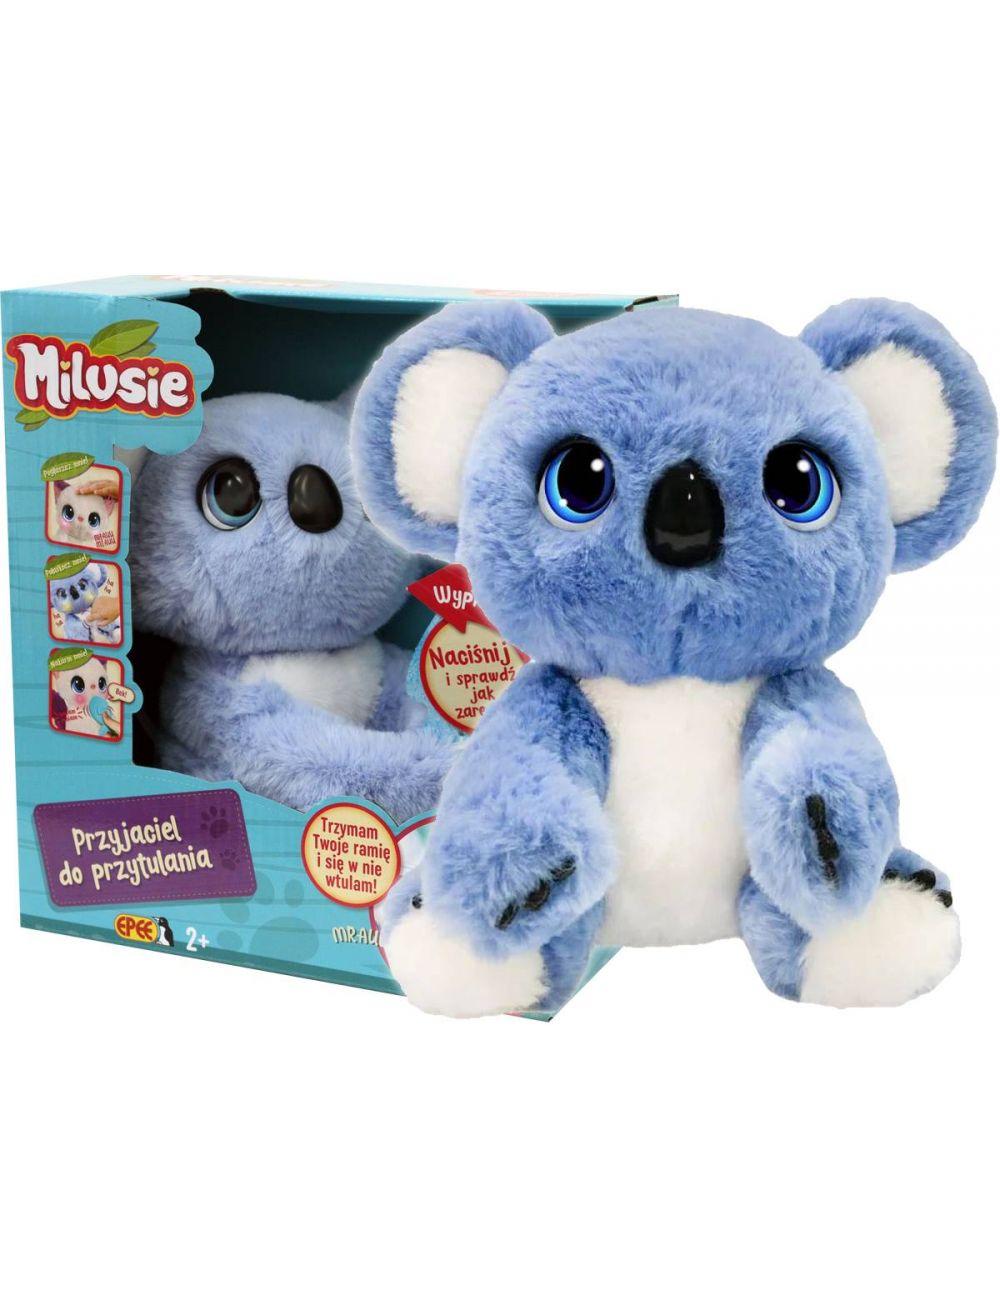 Epee Milusie Koala Interaktywny Pluszak Maskotka 03950